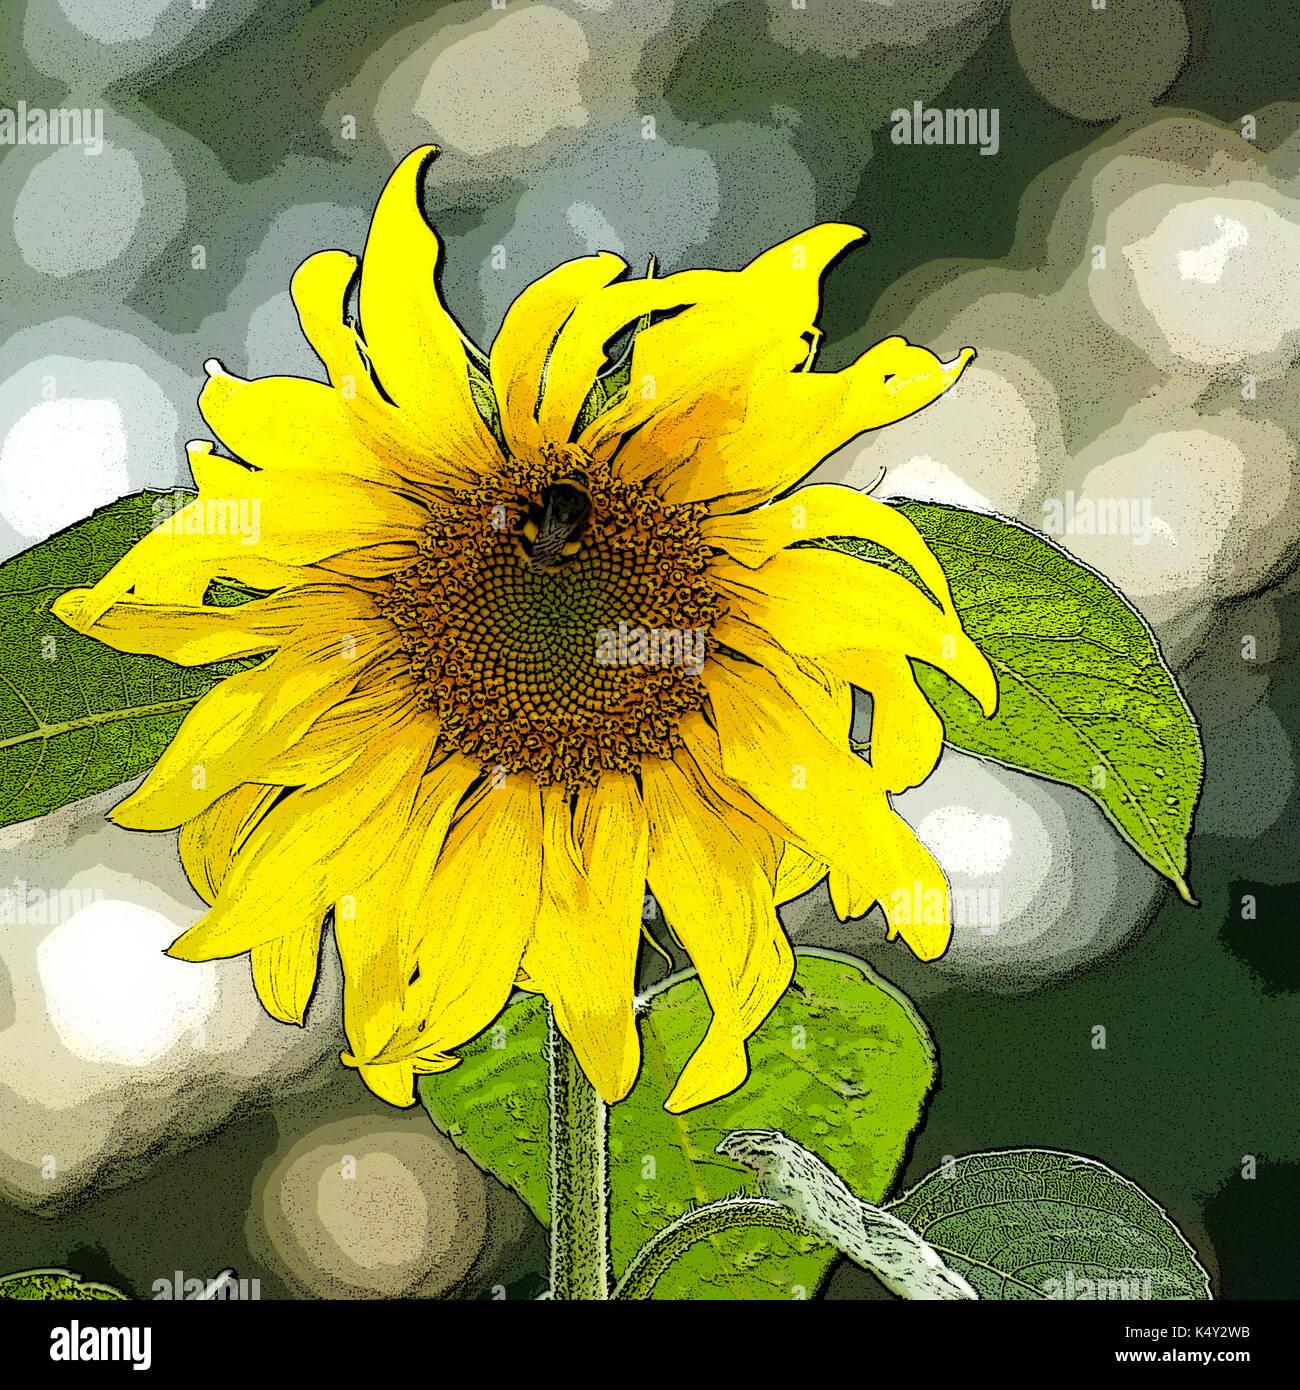 Sunflower with bee on set-aside land. Photoshop posterisation. - Stock Image